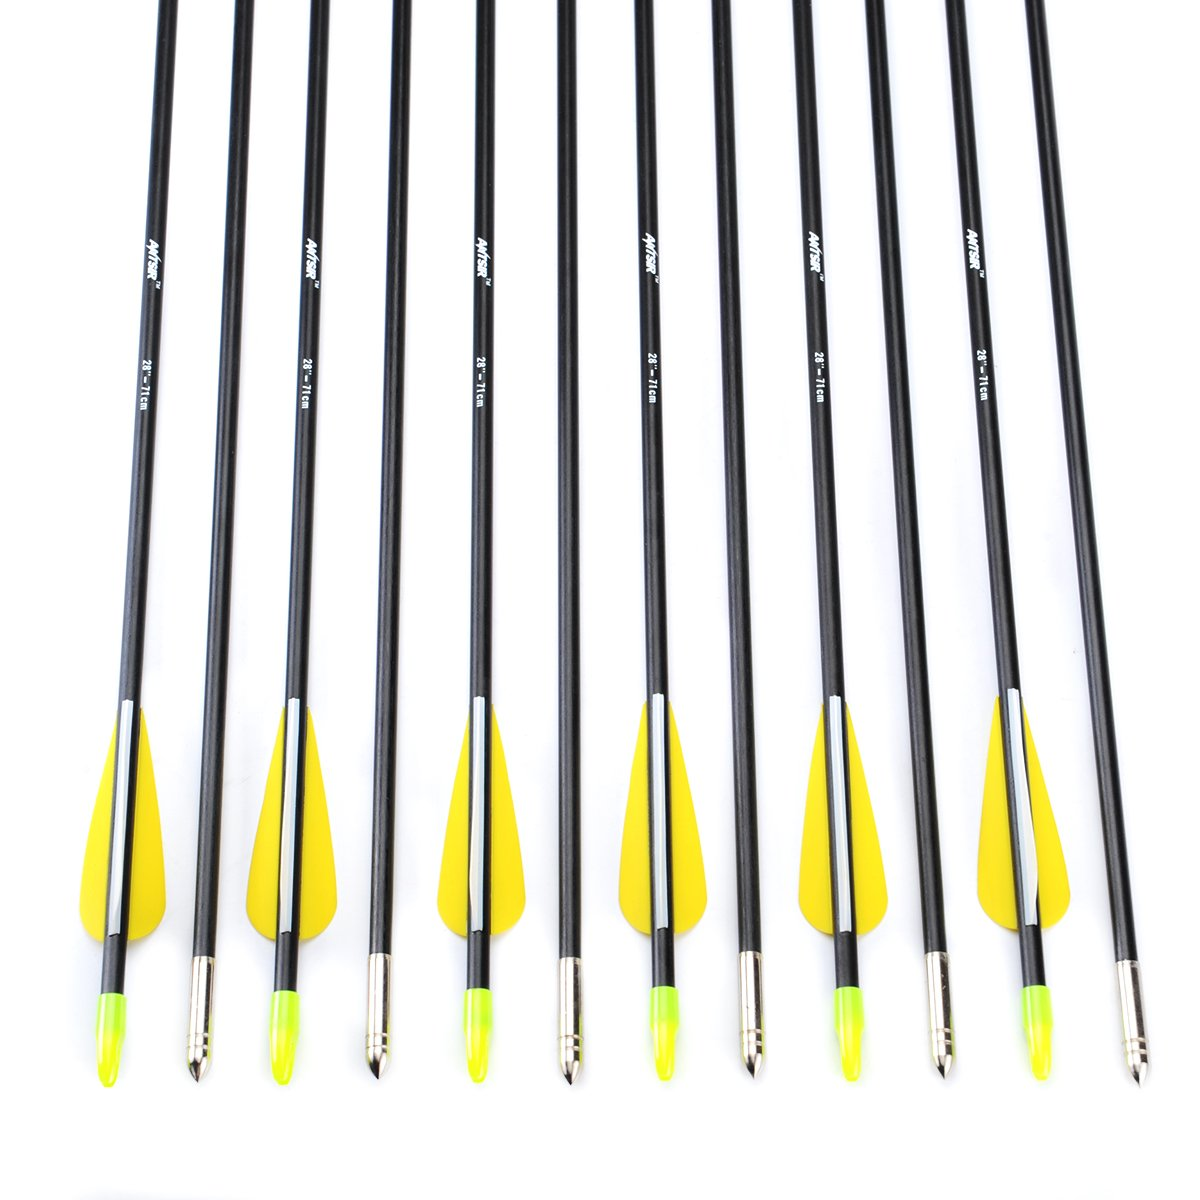 12X28/'/' Fiberglass Arrows Archery OD 7MM FOR Children Outdoor Practice Shoot